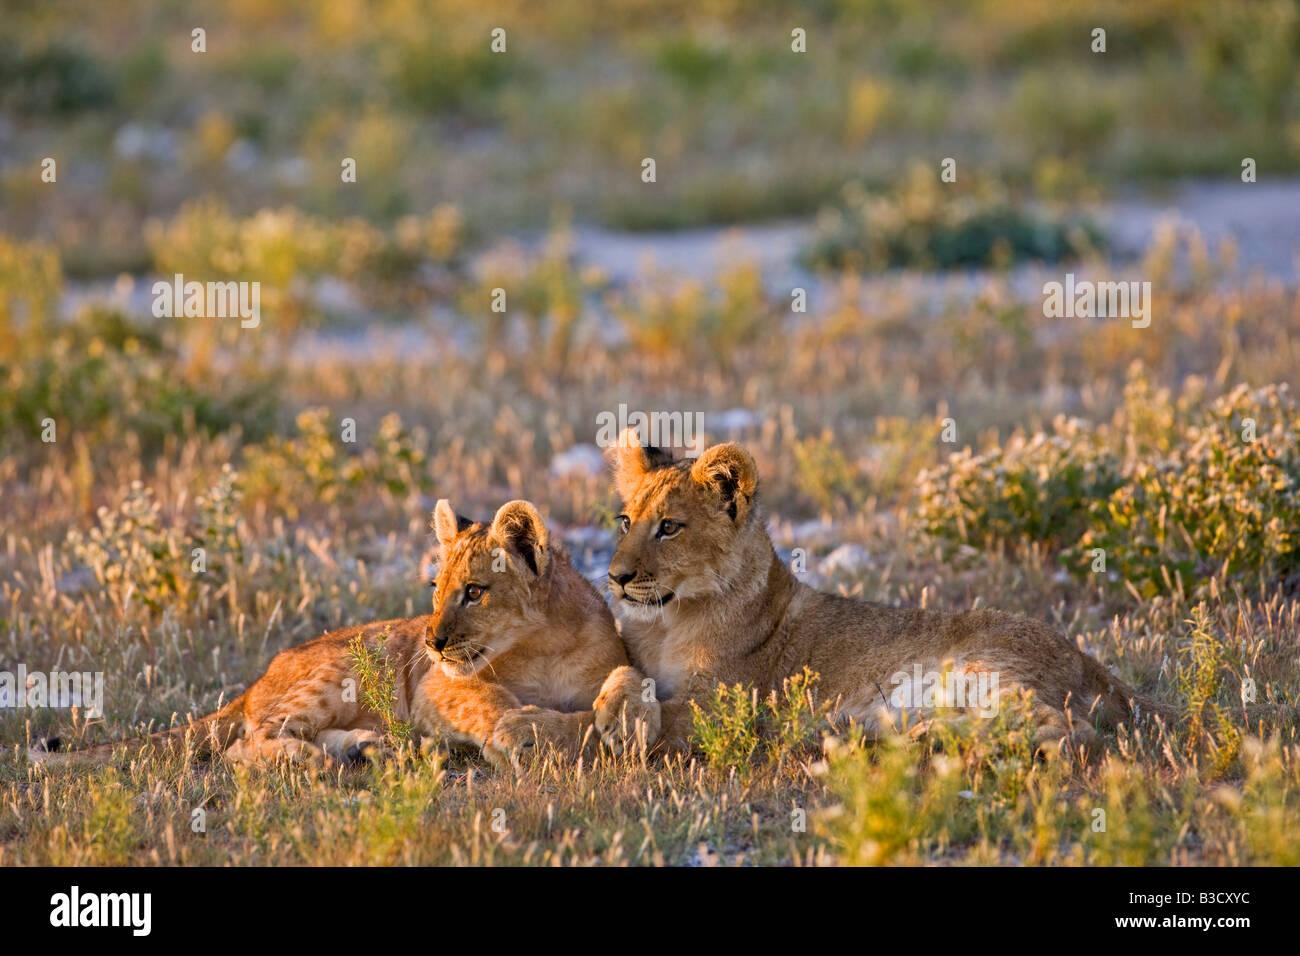 Afrika, Botswana, Löwenbabys (Panthera Leo) Stockfoto